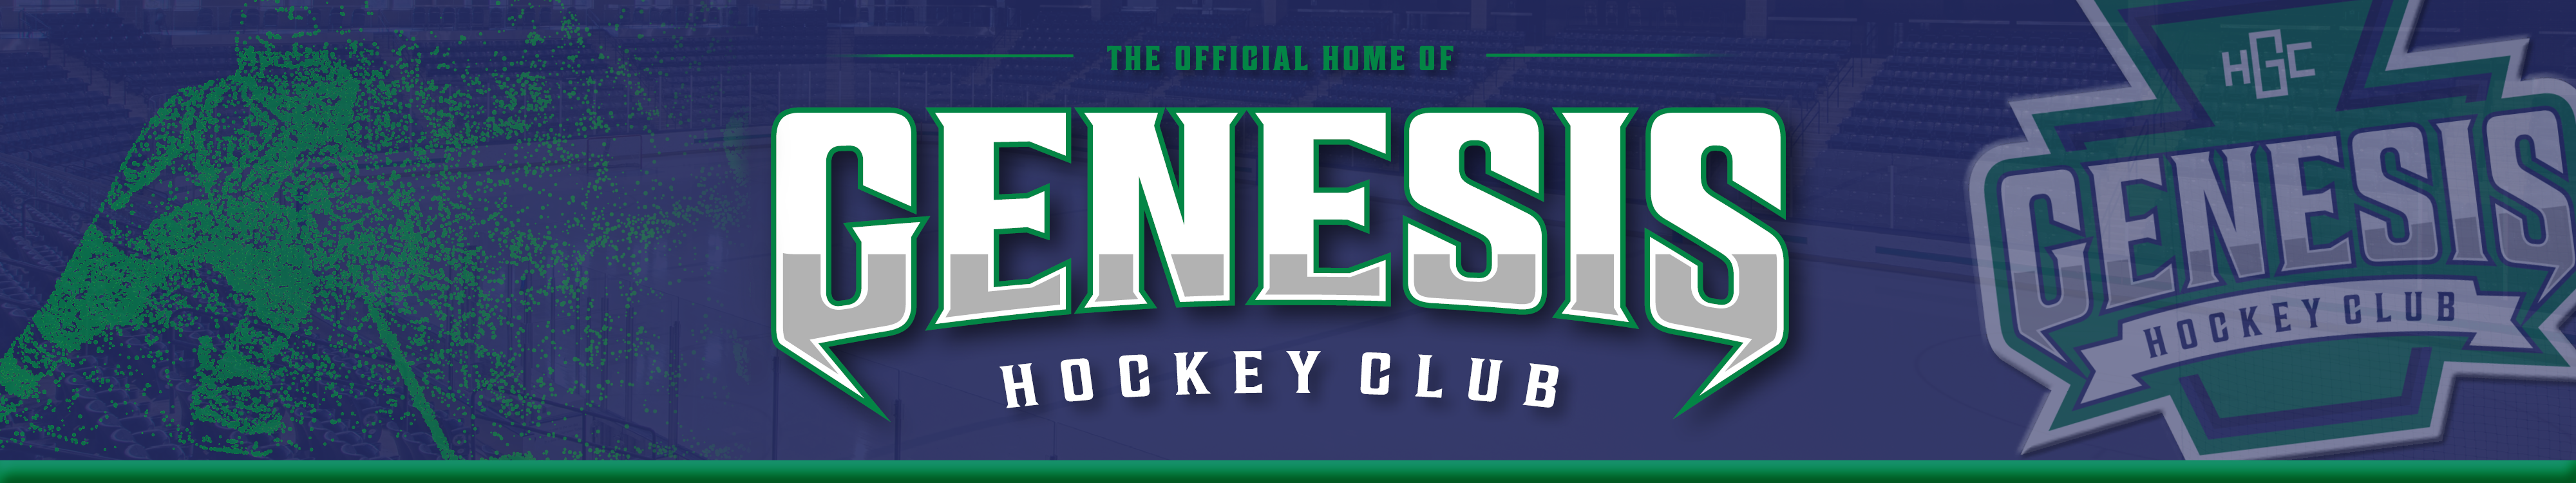 20190326 genesis website banner